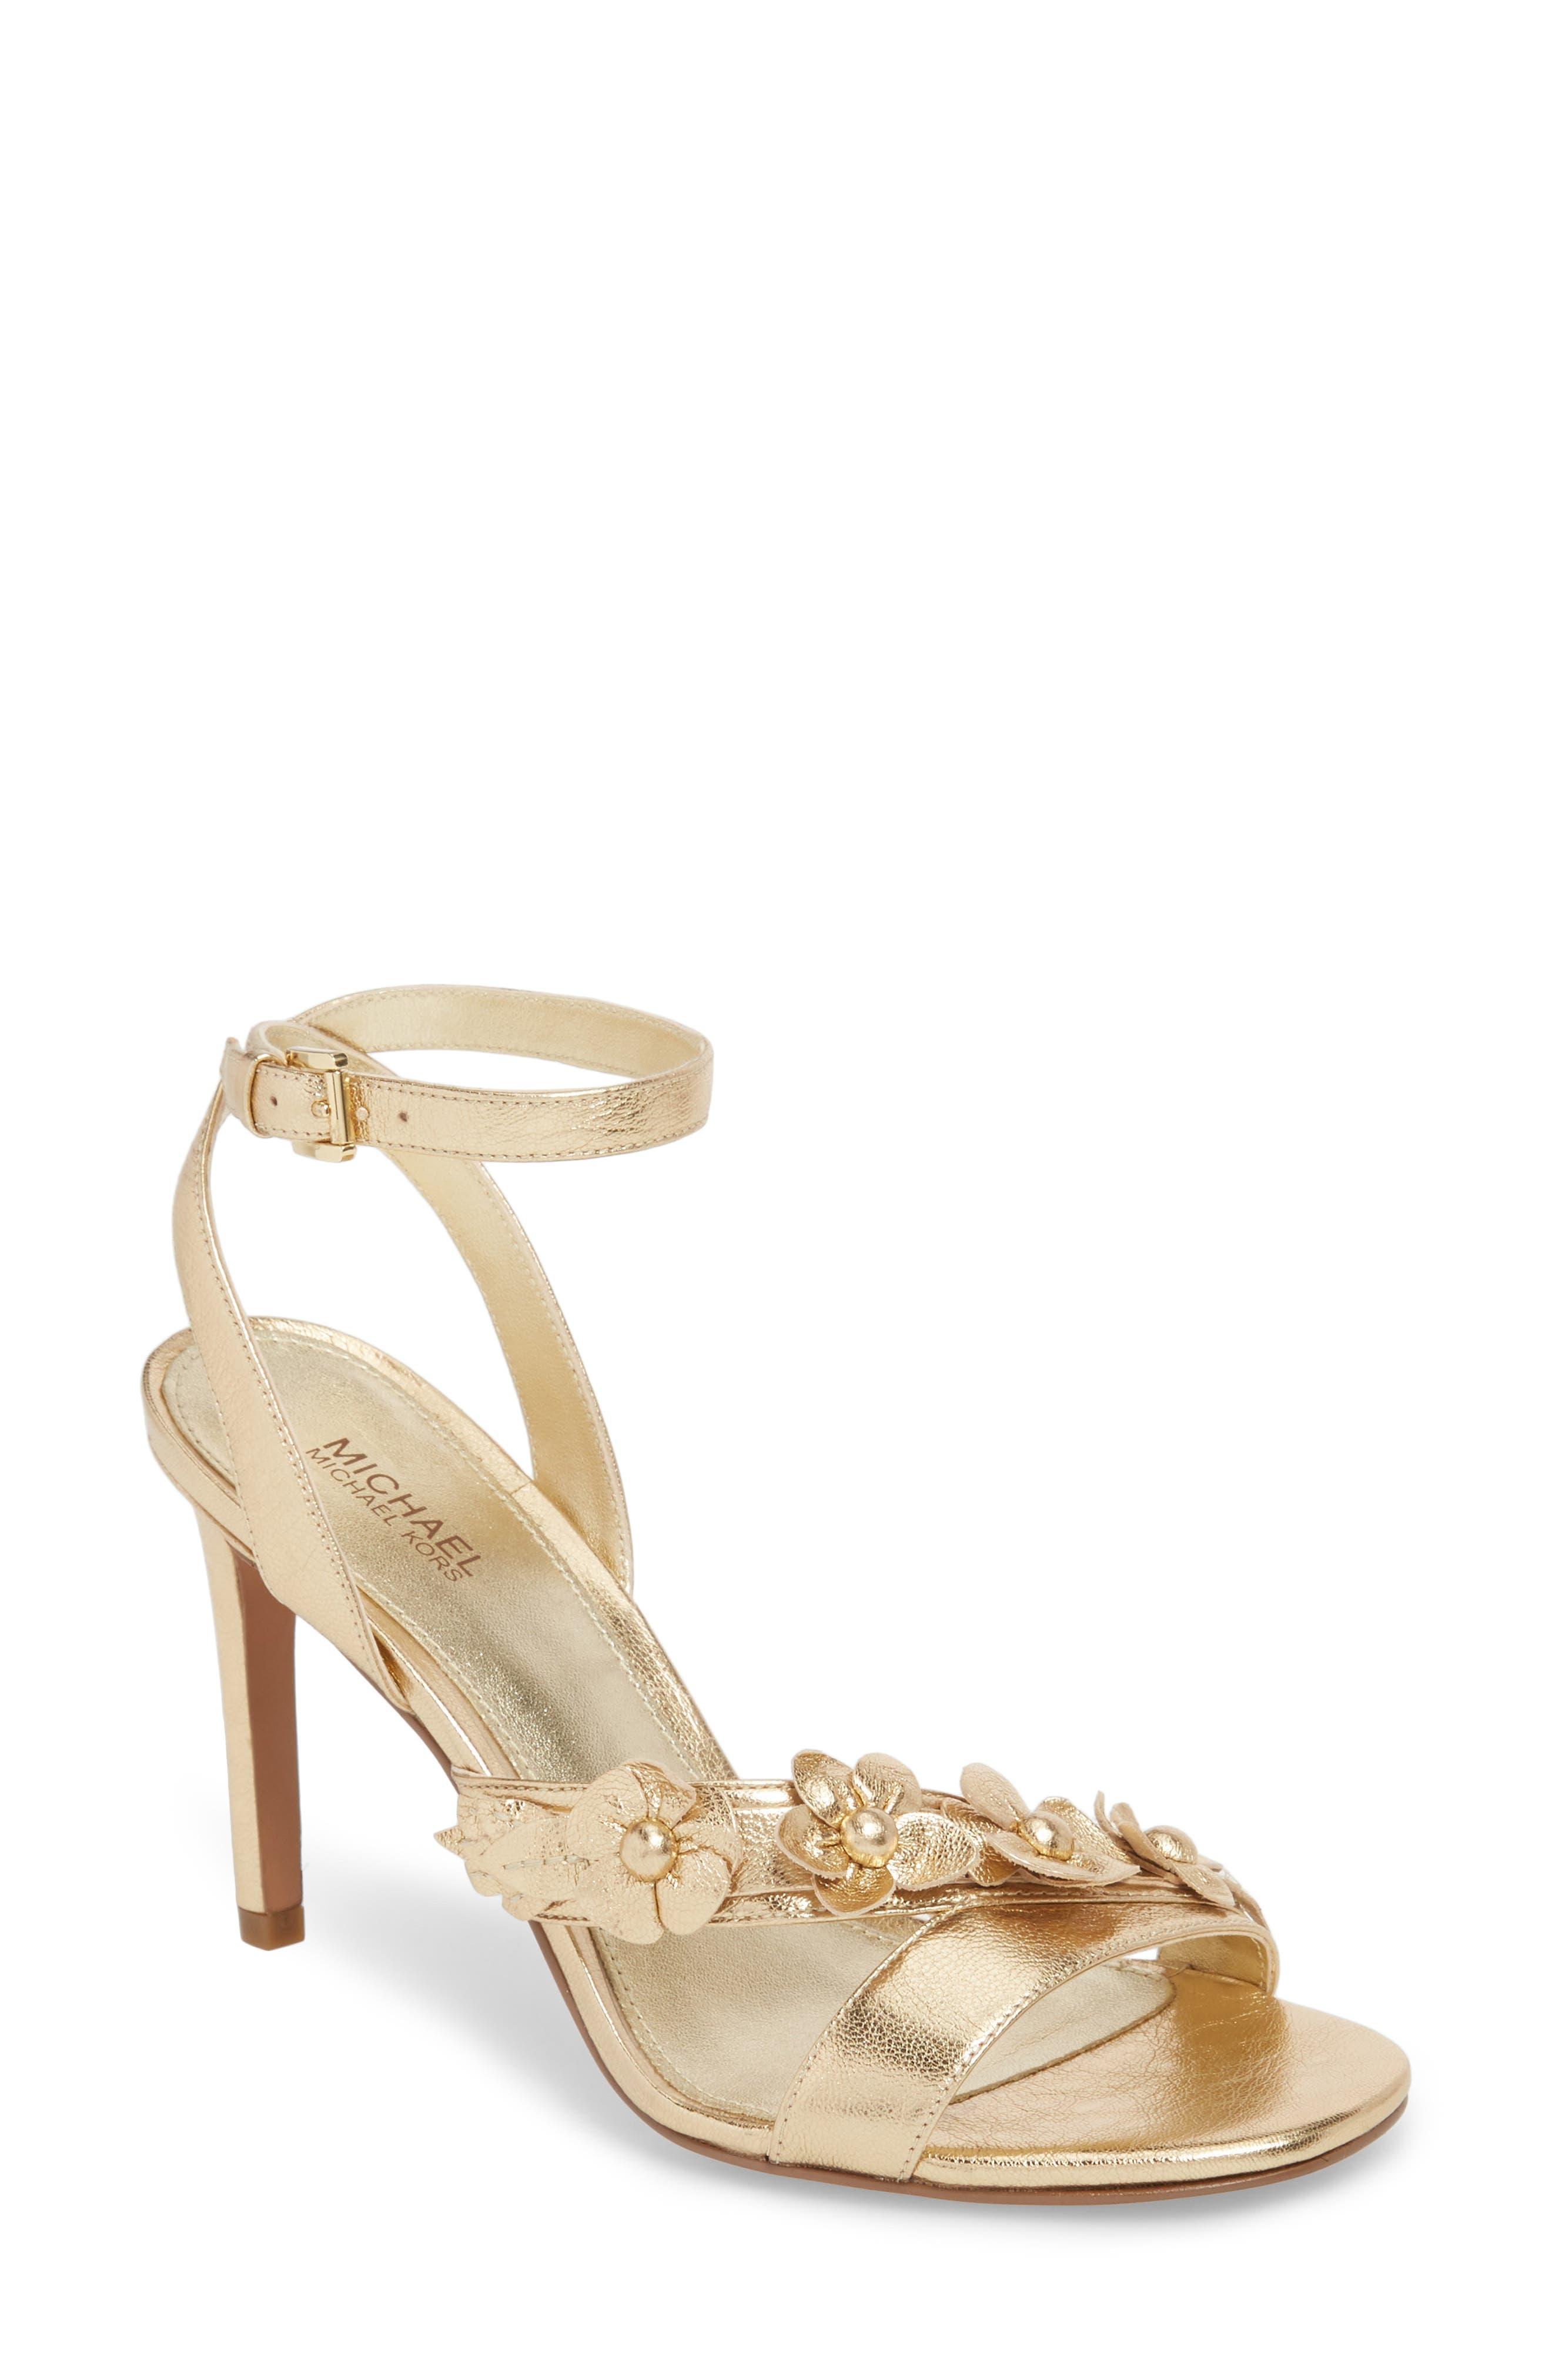 Tricia Sandal,                             Main thumbnail 1, color,                             Pale Gold Leather